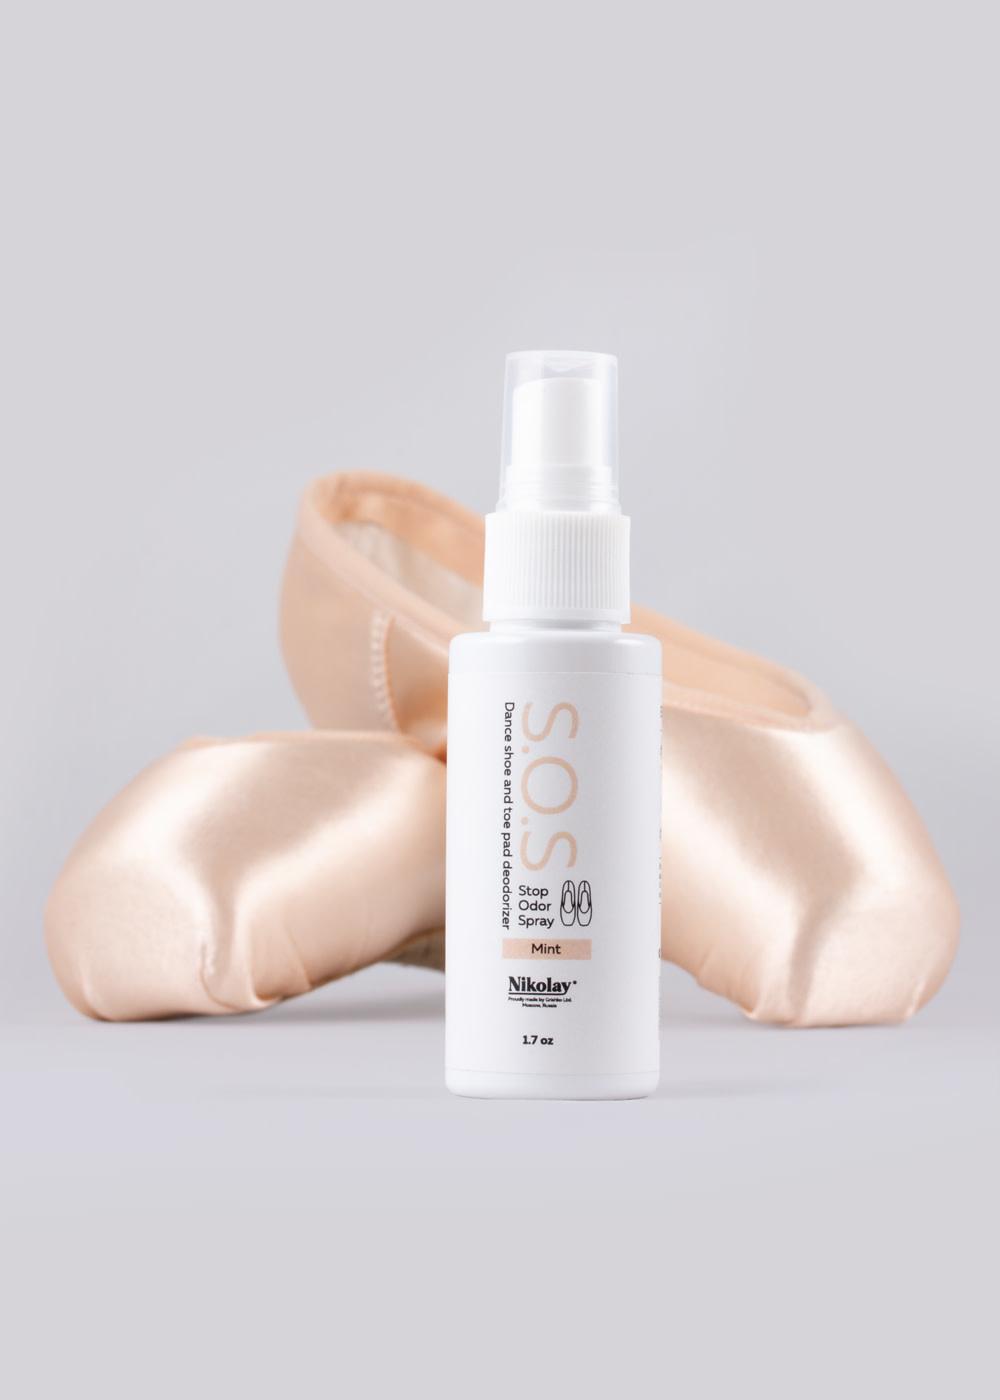 Nikolay Pointe Shoe Odor Eliminating Spray - 1.7 Oz